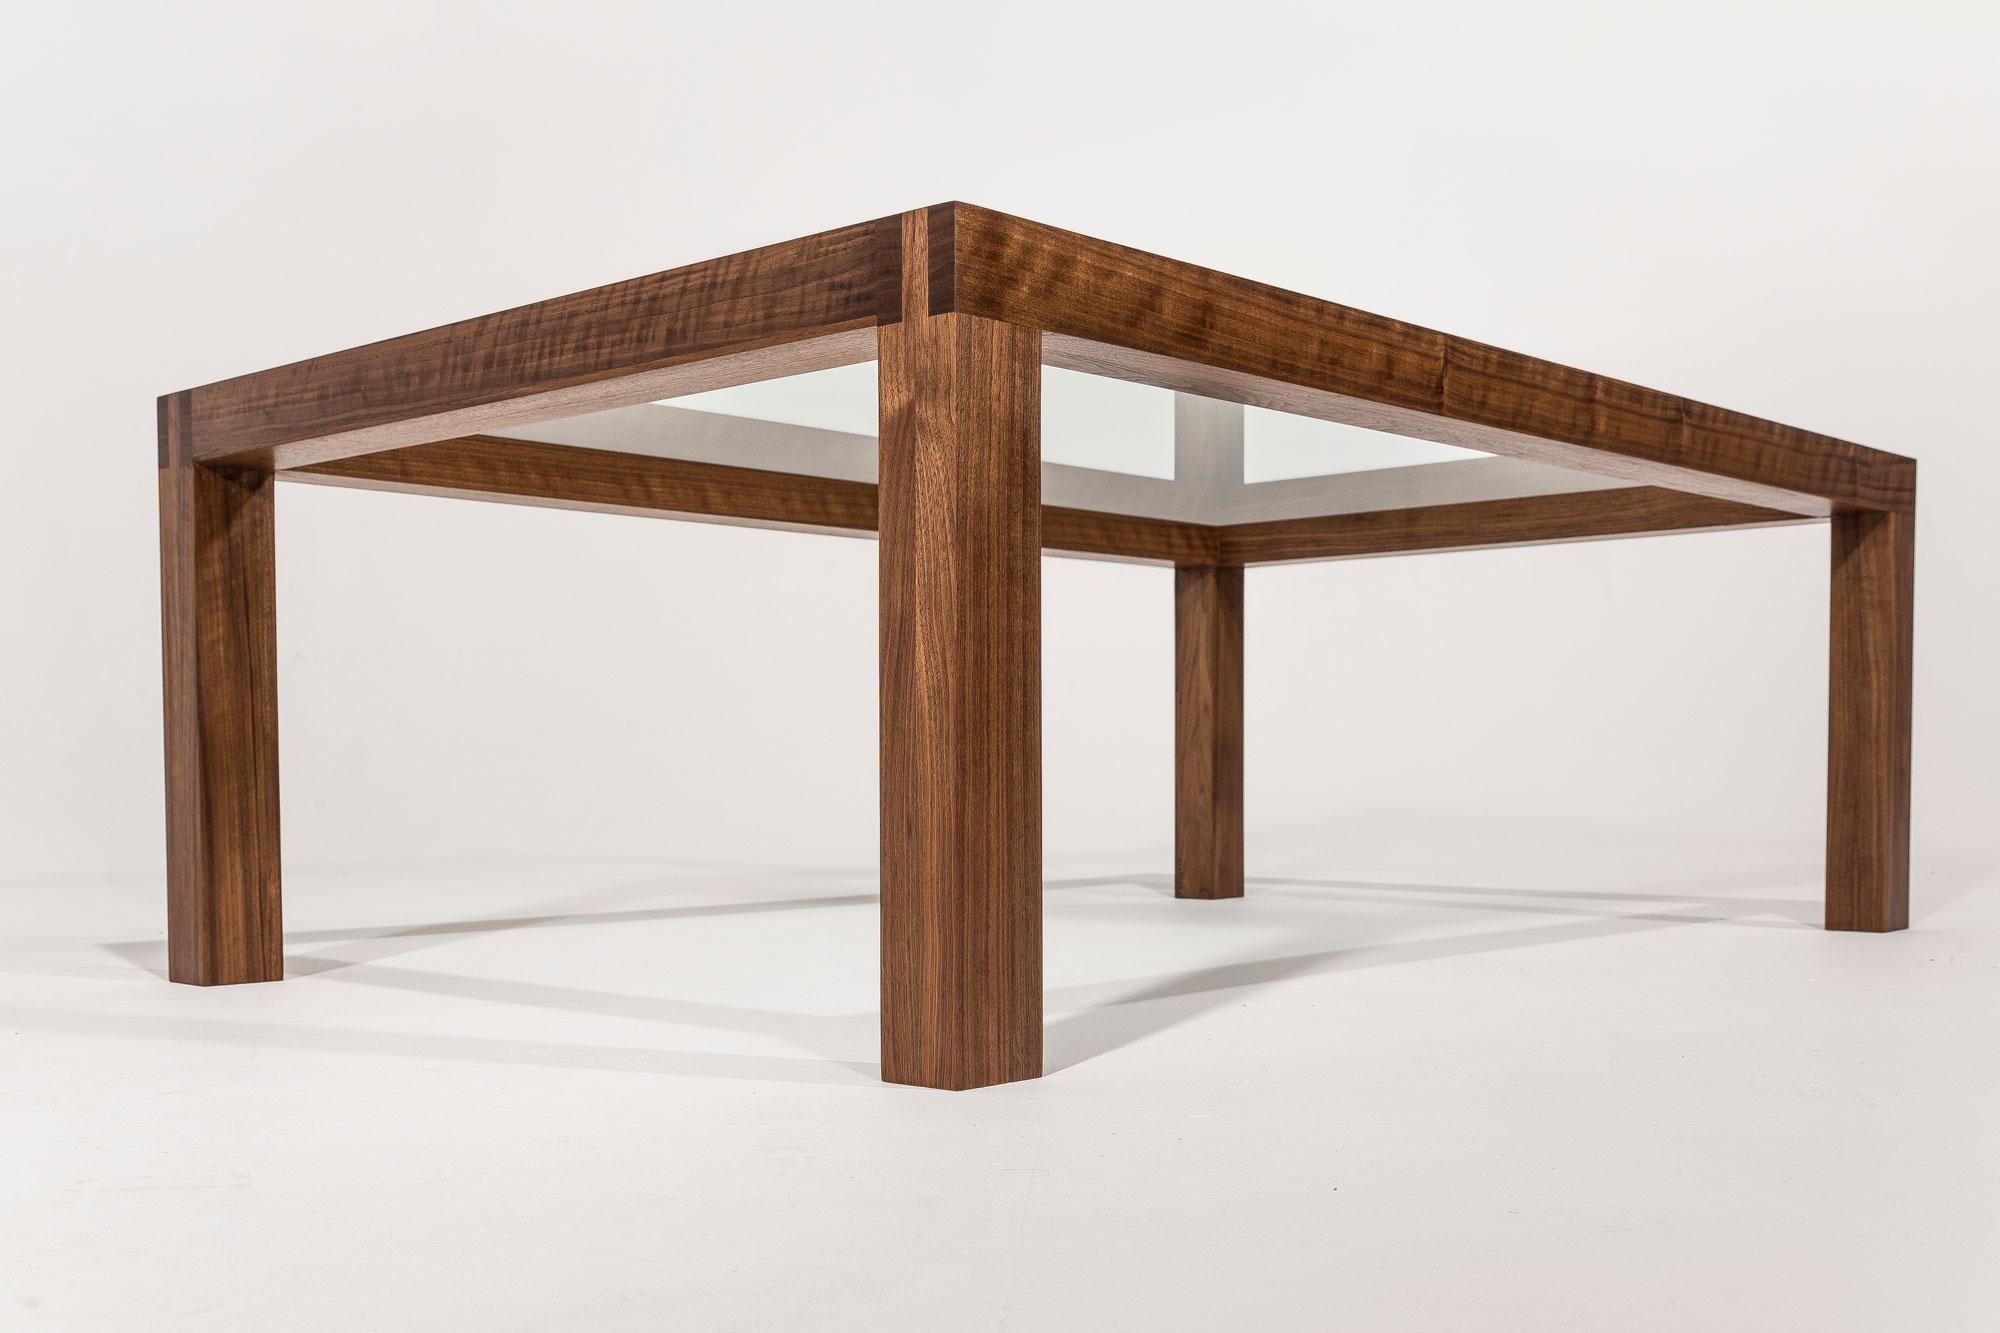 Notenhout-salontafel